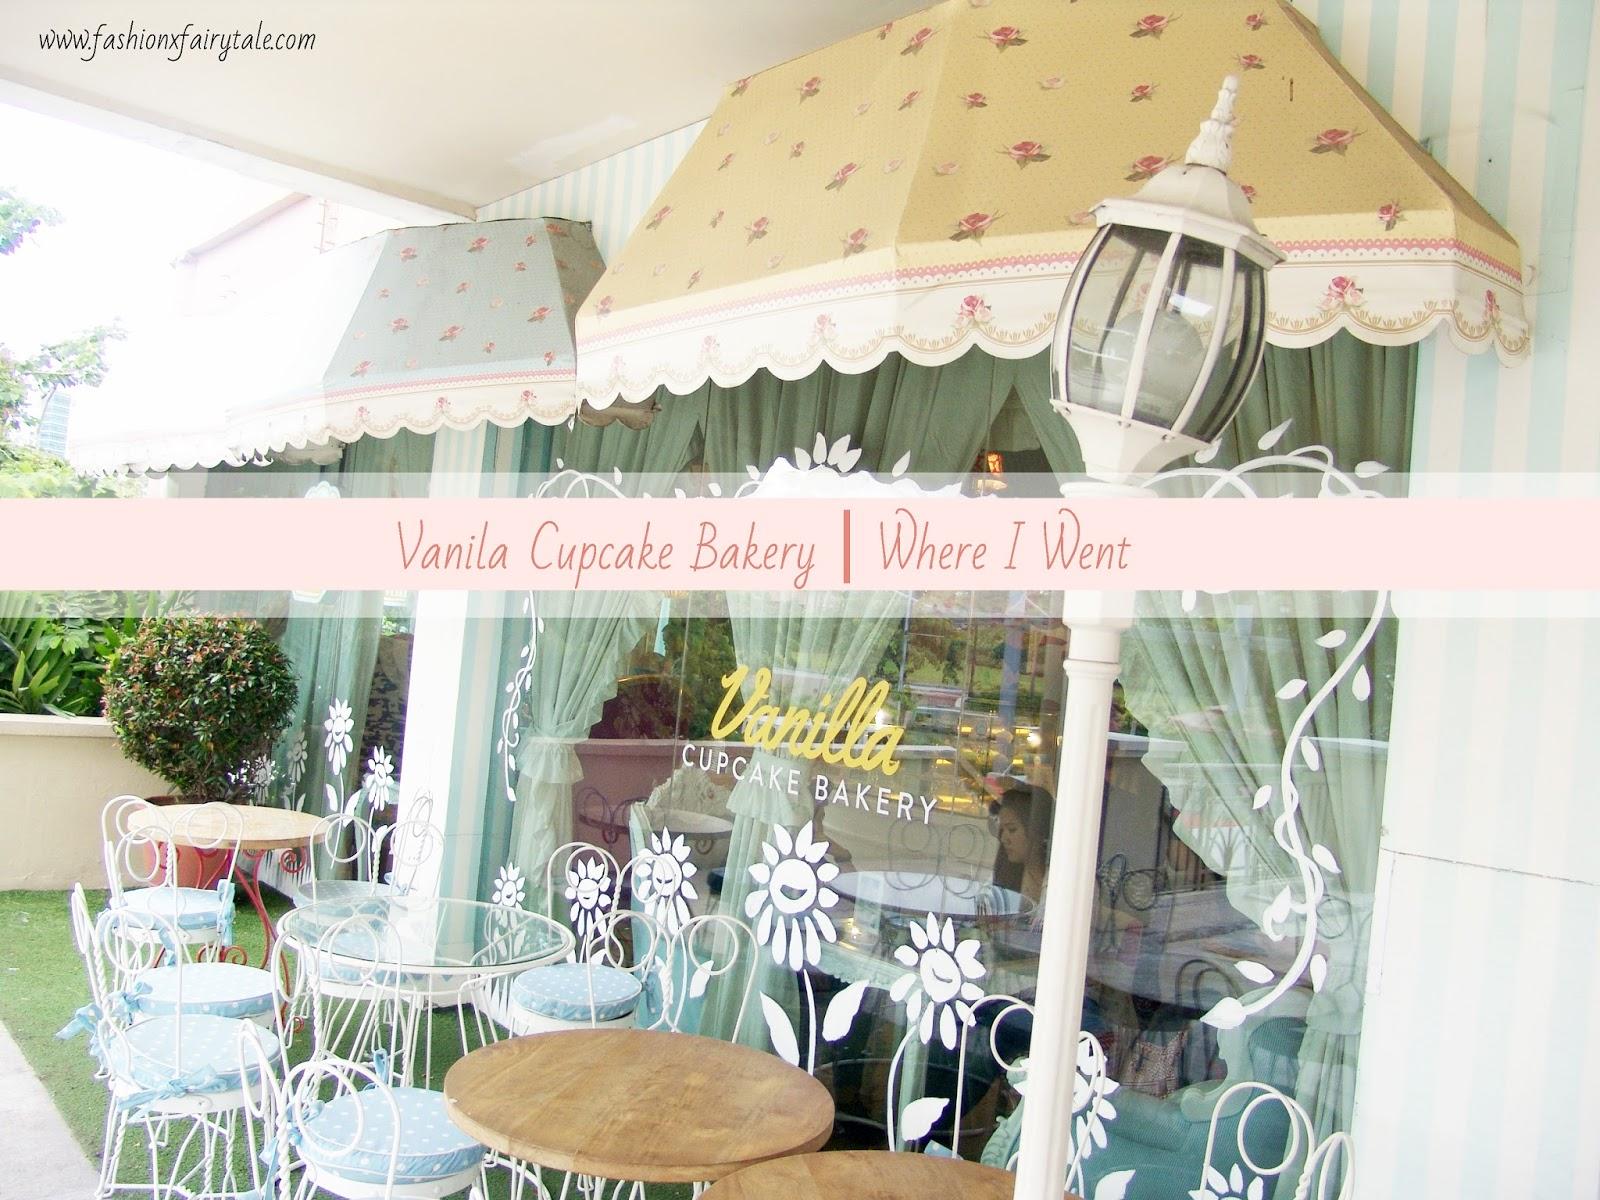 Vanilla Cupcake Bakery   Where I Went